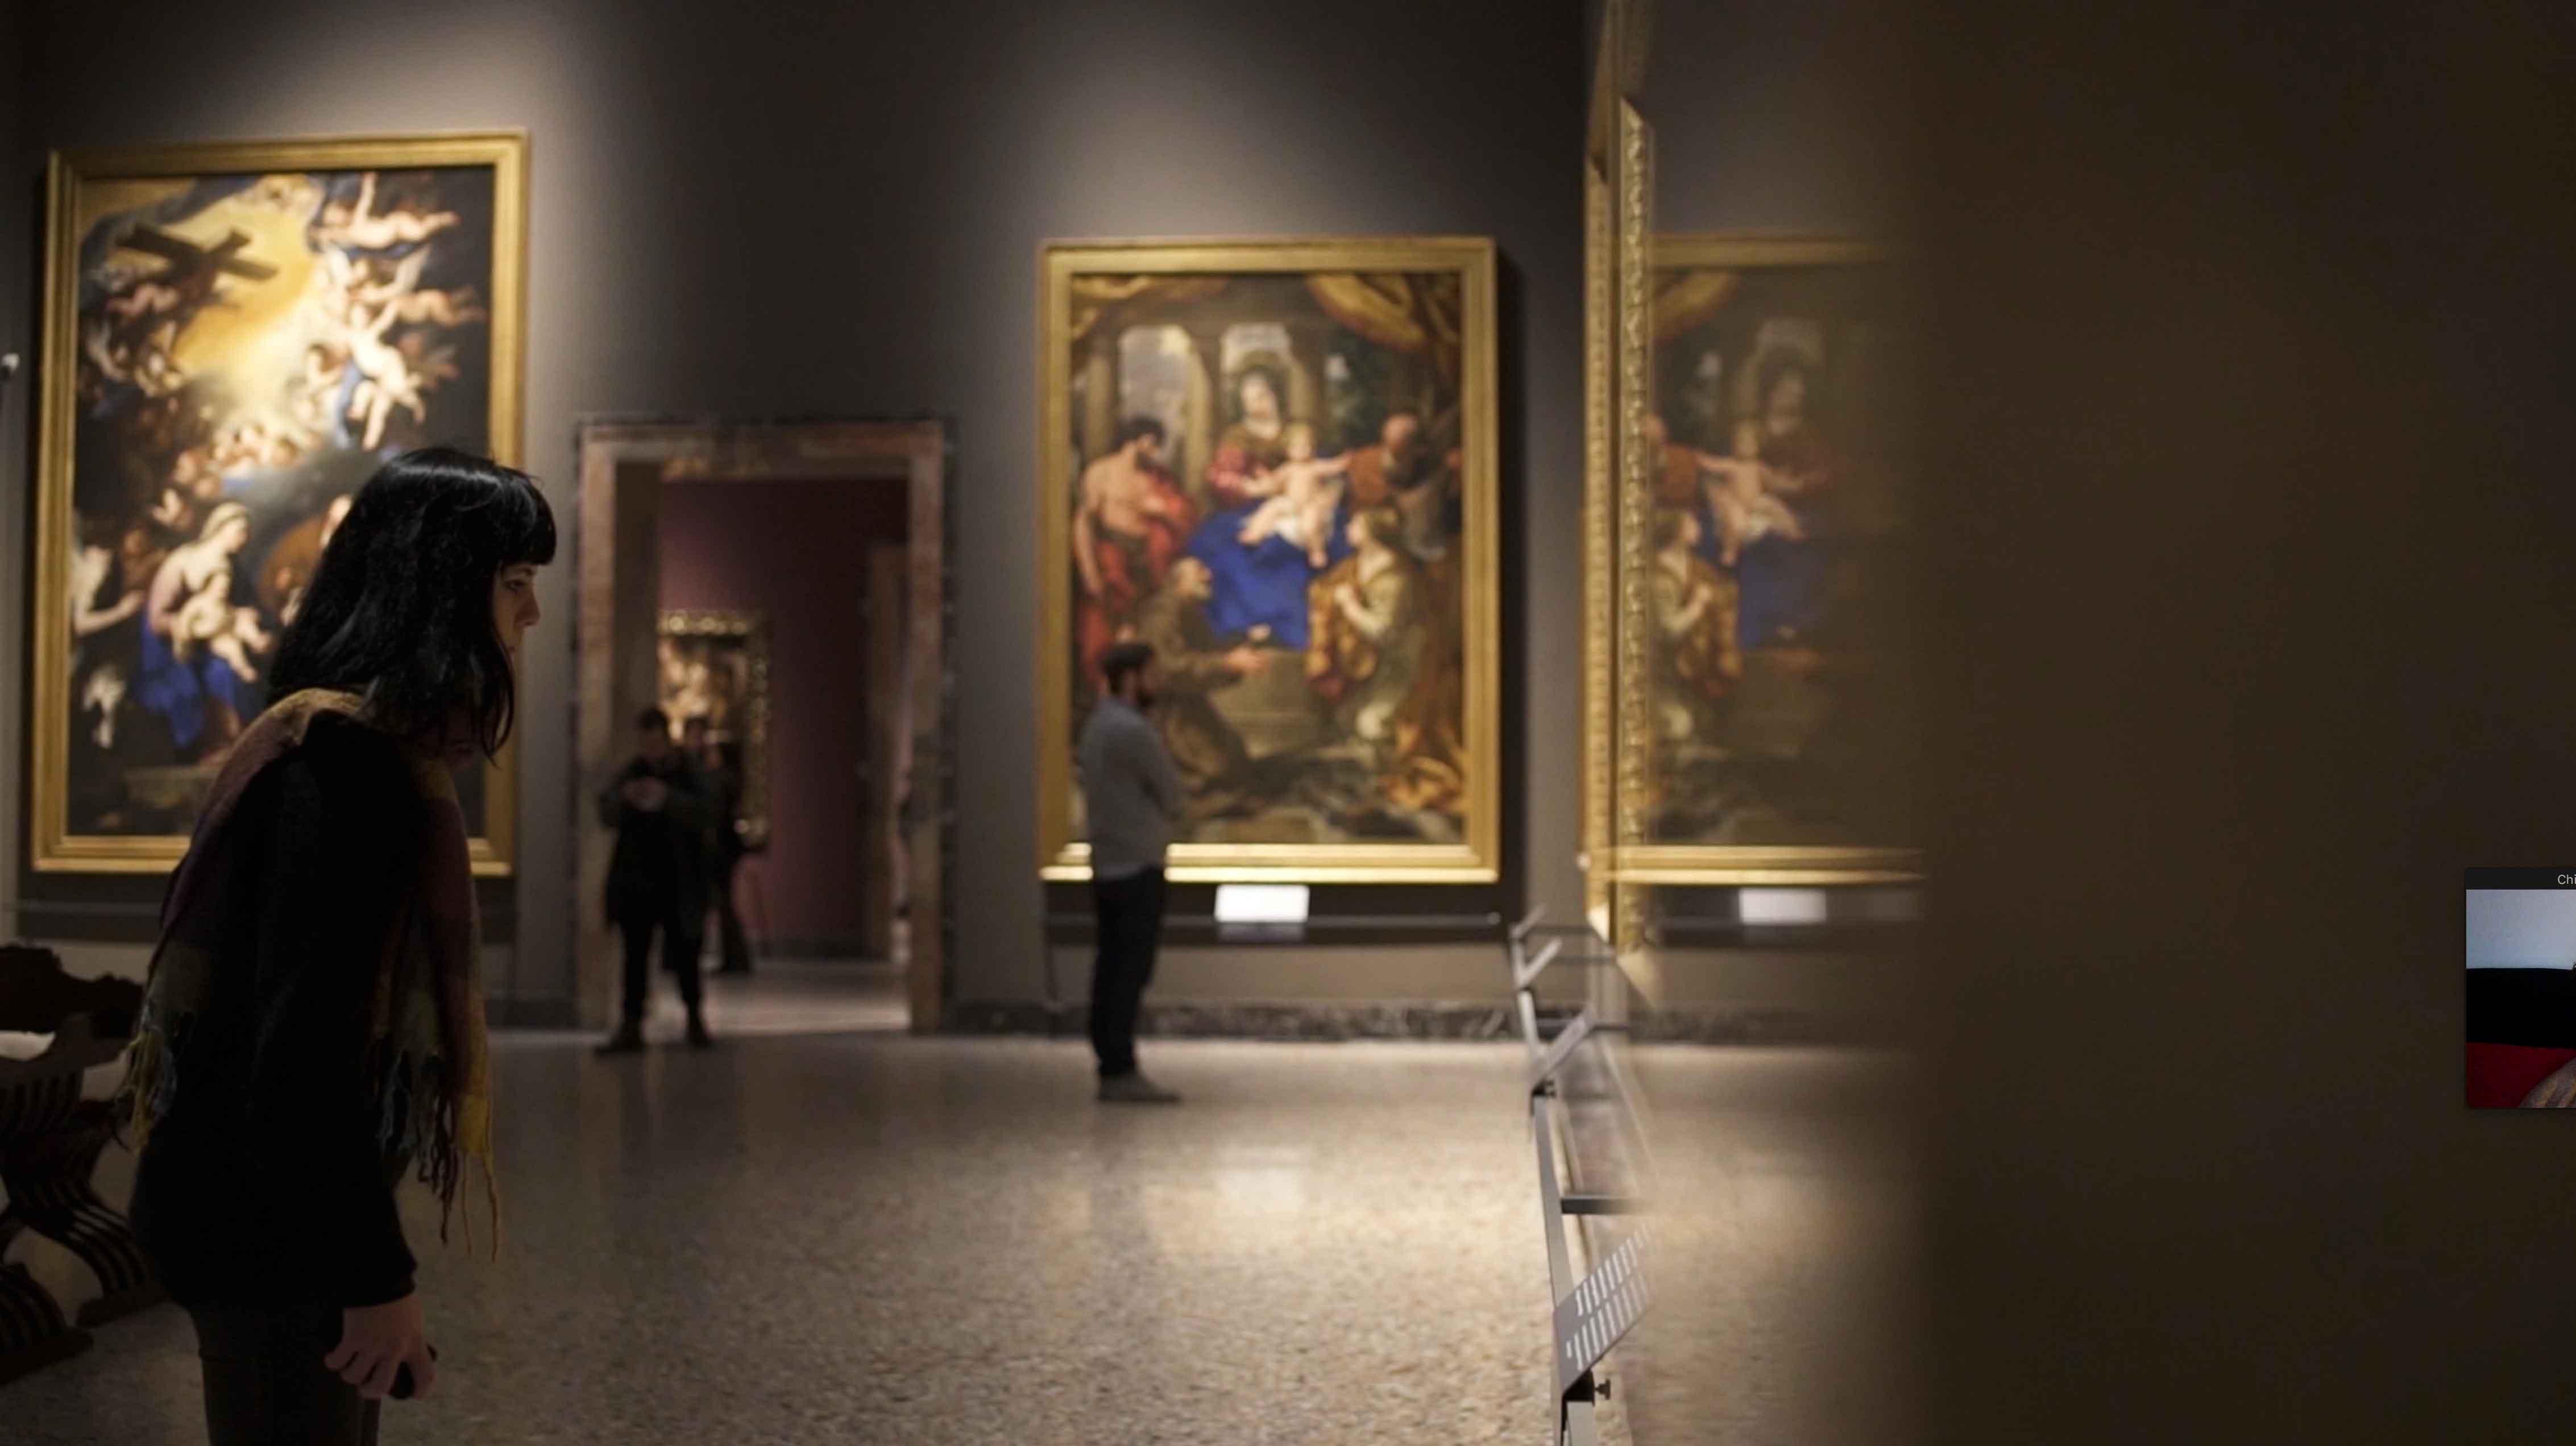 Una sera al museo <br>con 2 euro